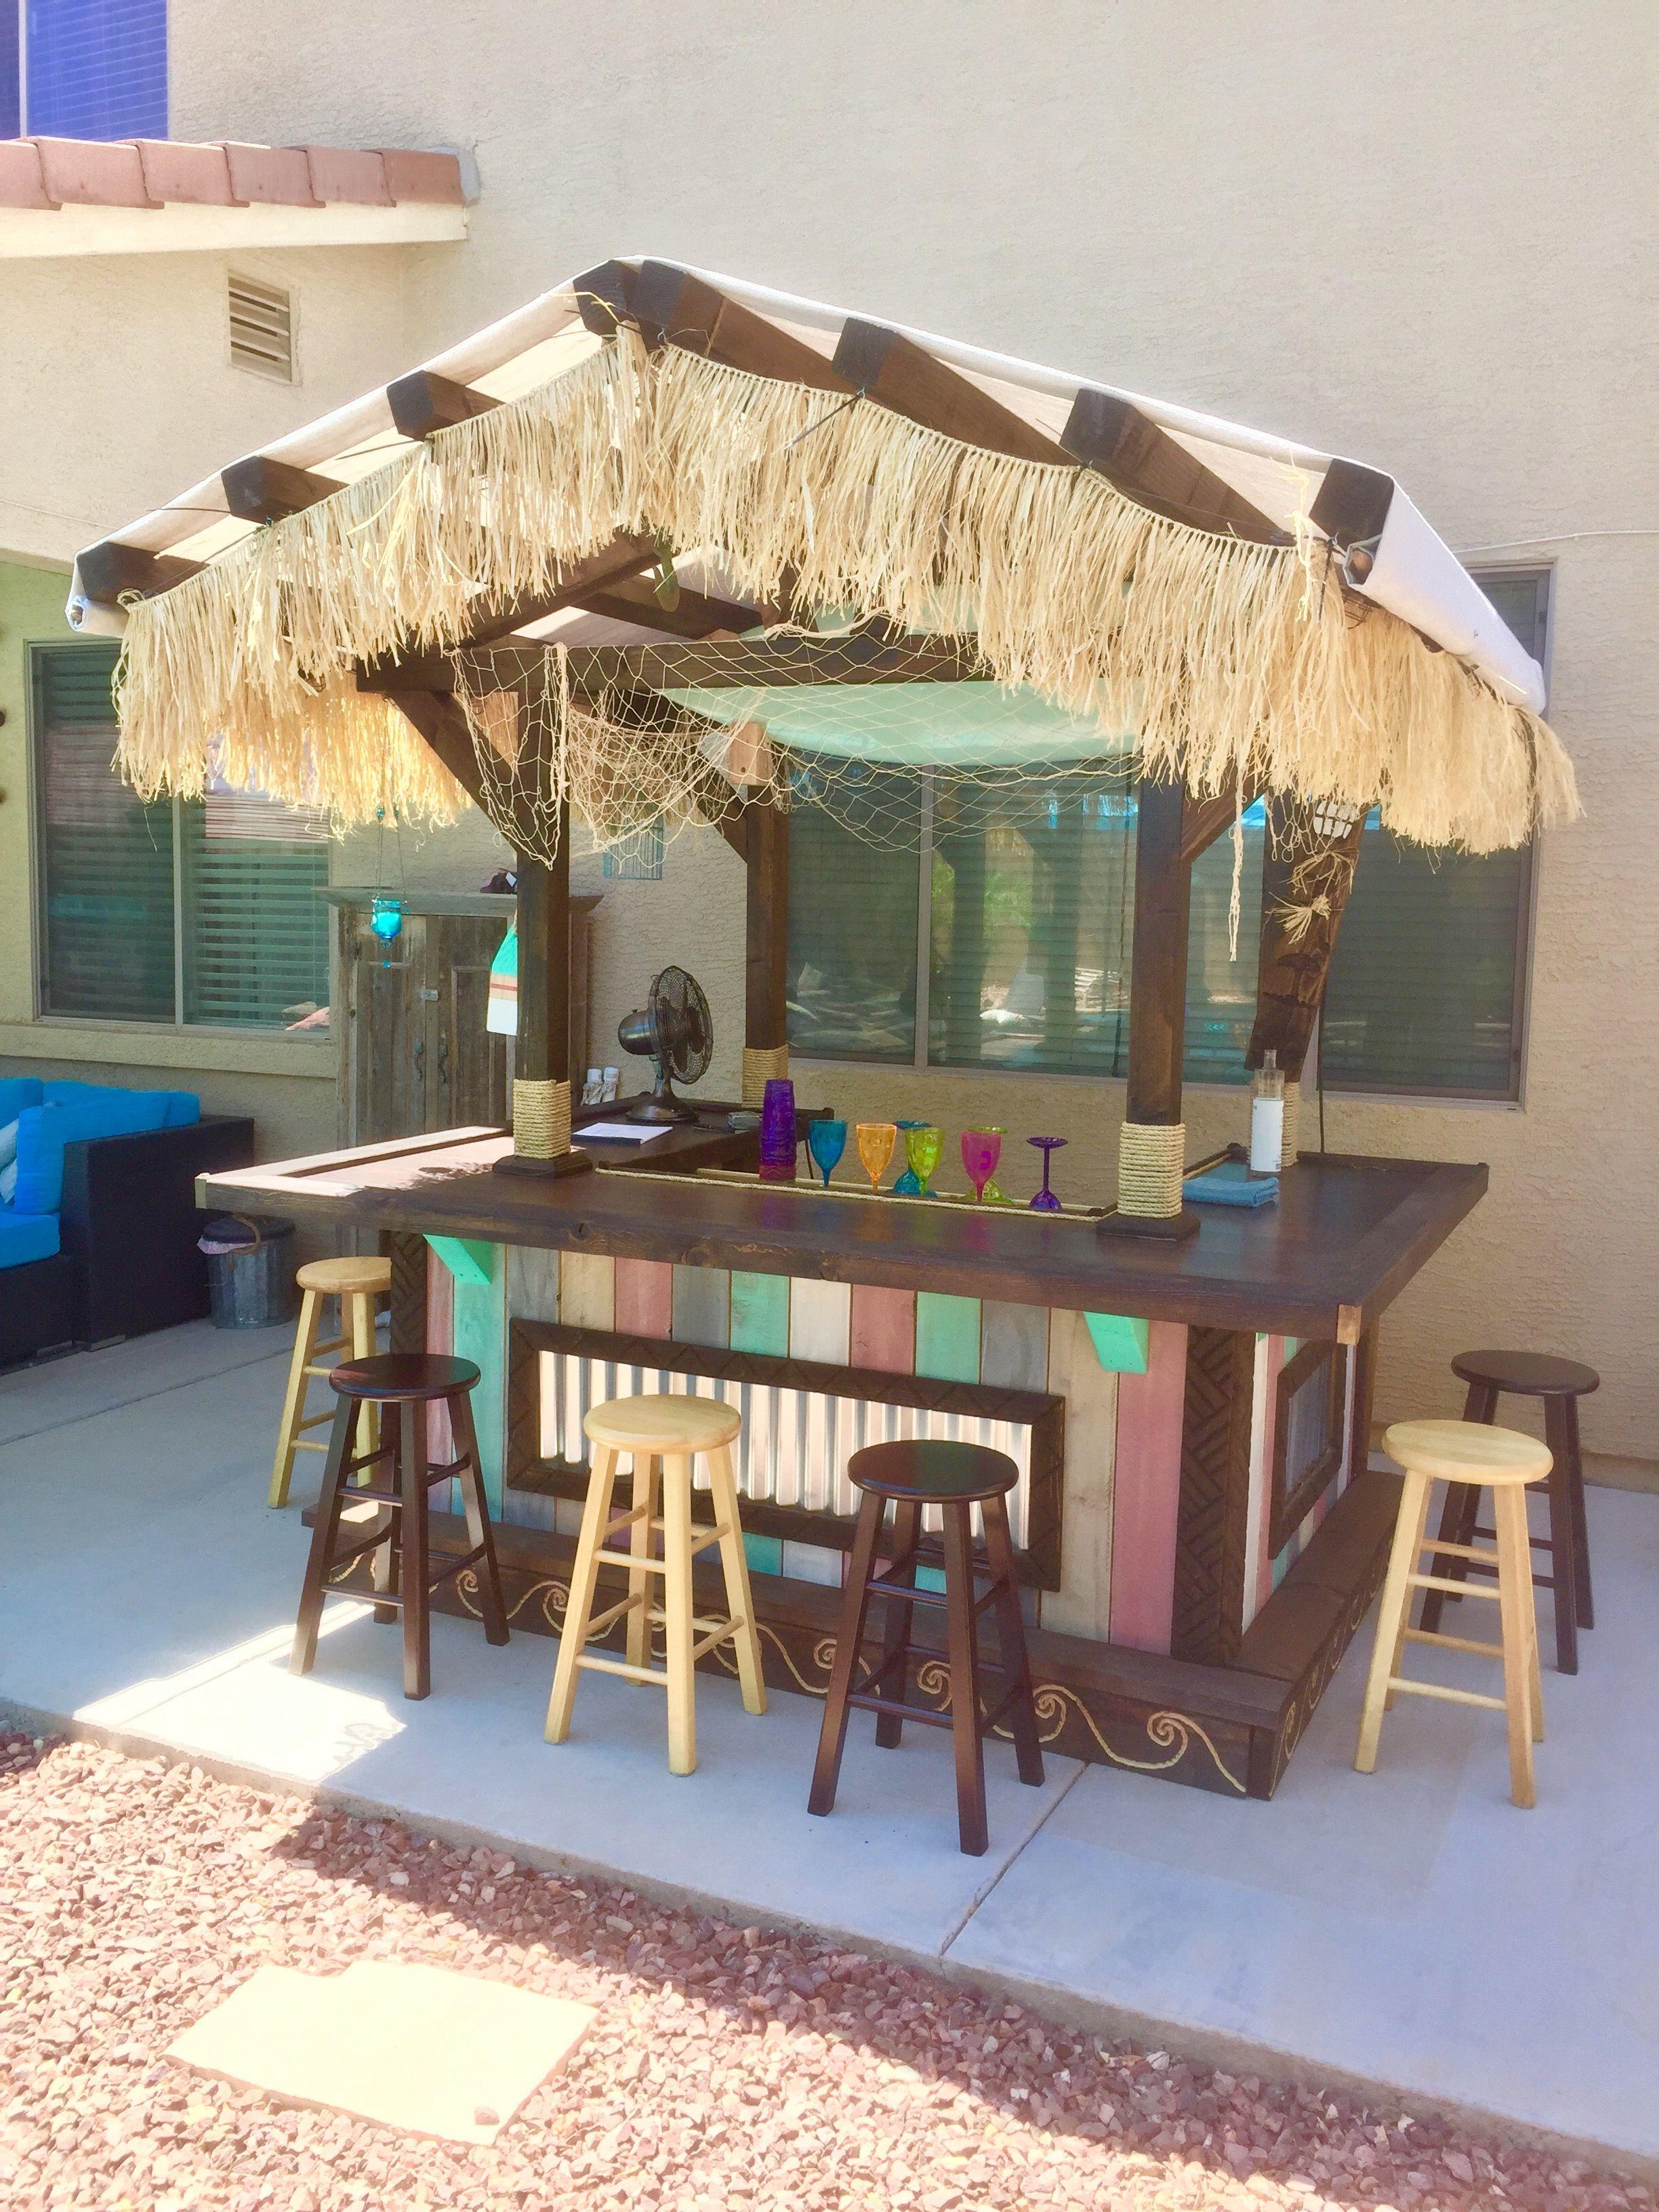 10 Outdoor Bar Ideas from Rustic to Lavish   Outdoor tiki ... on Outdoor Bar Patio Ideas id=64317